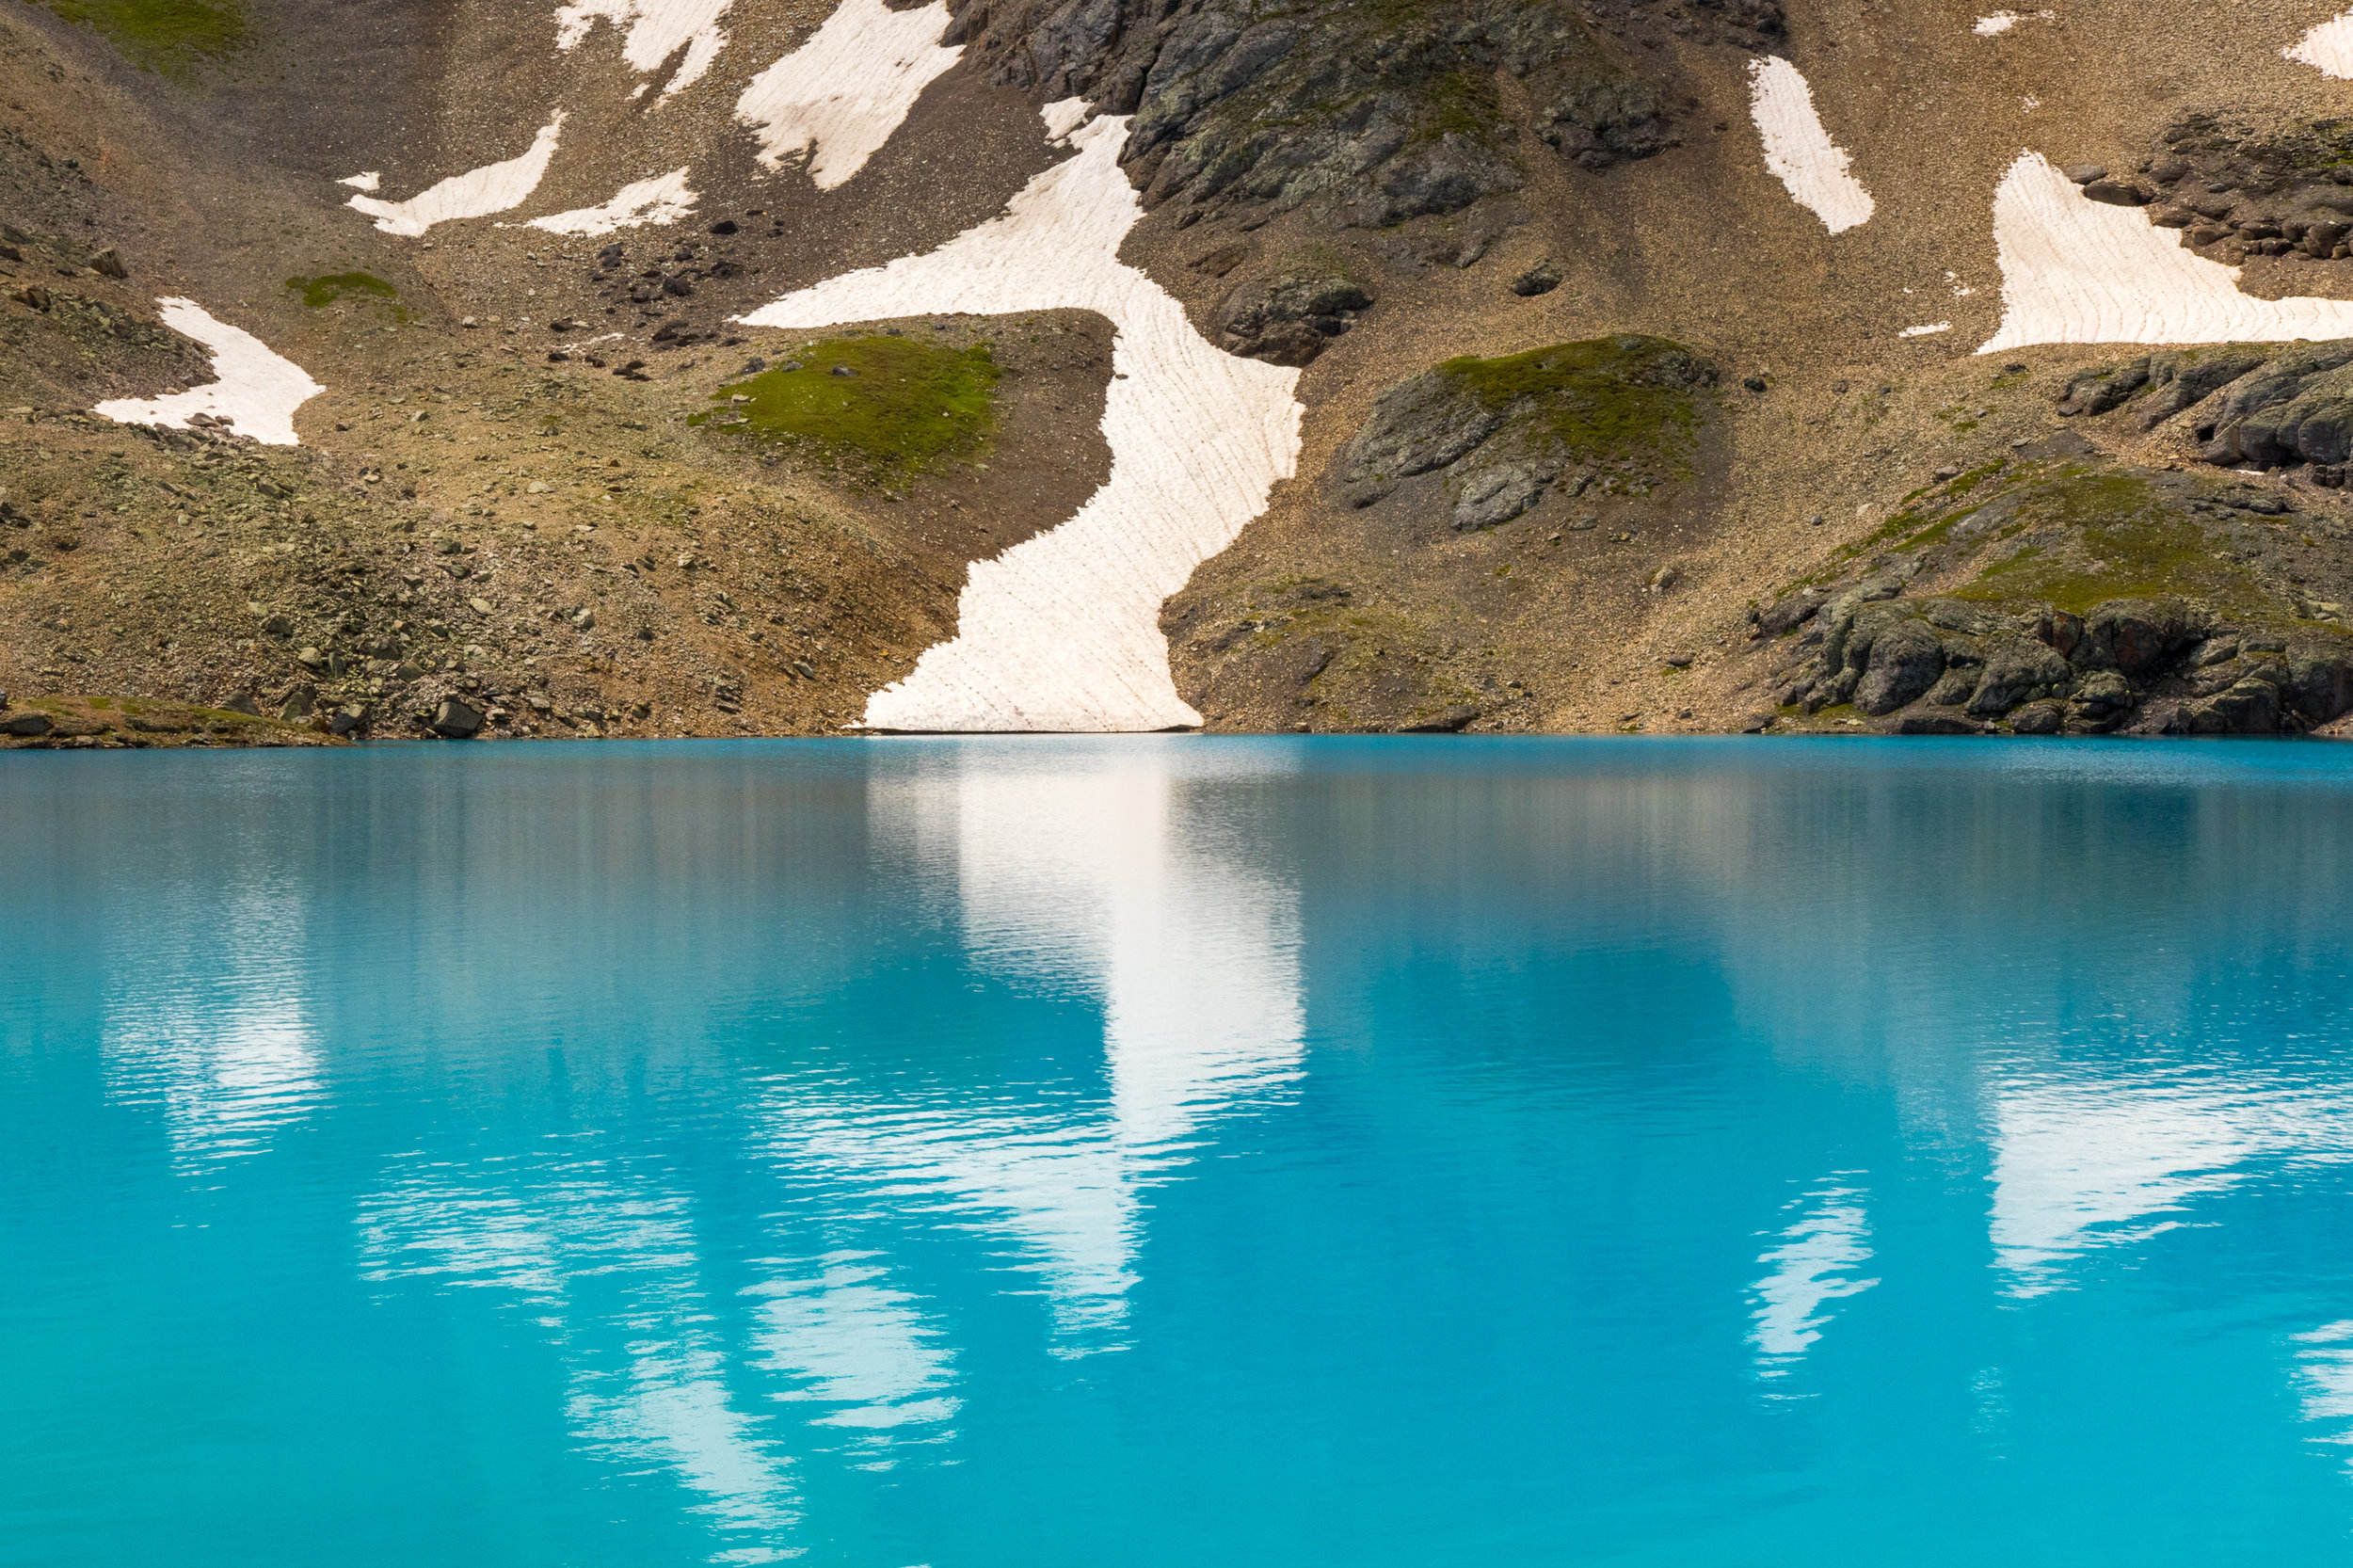 Reflection at Columbine Lake